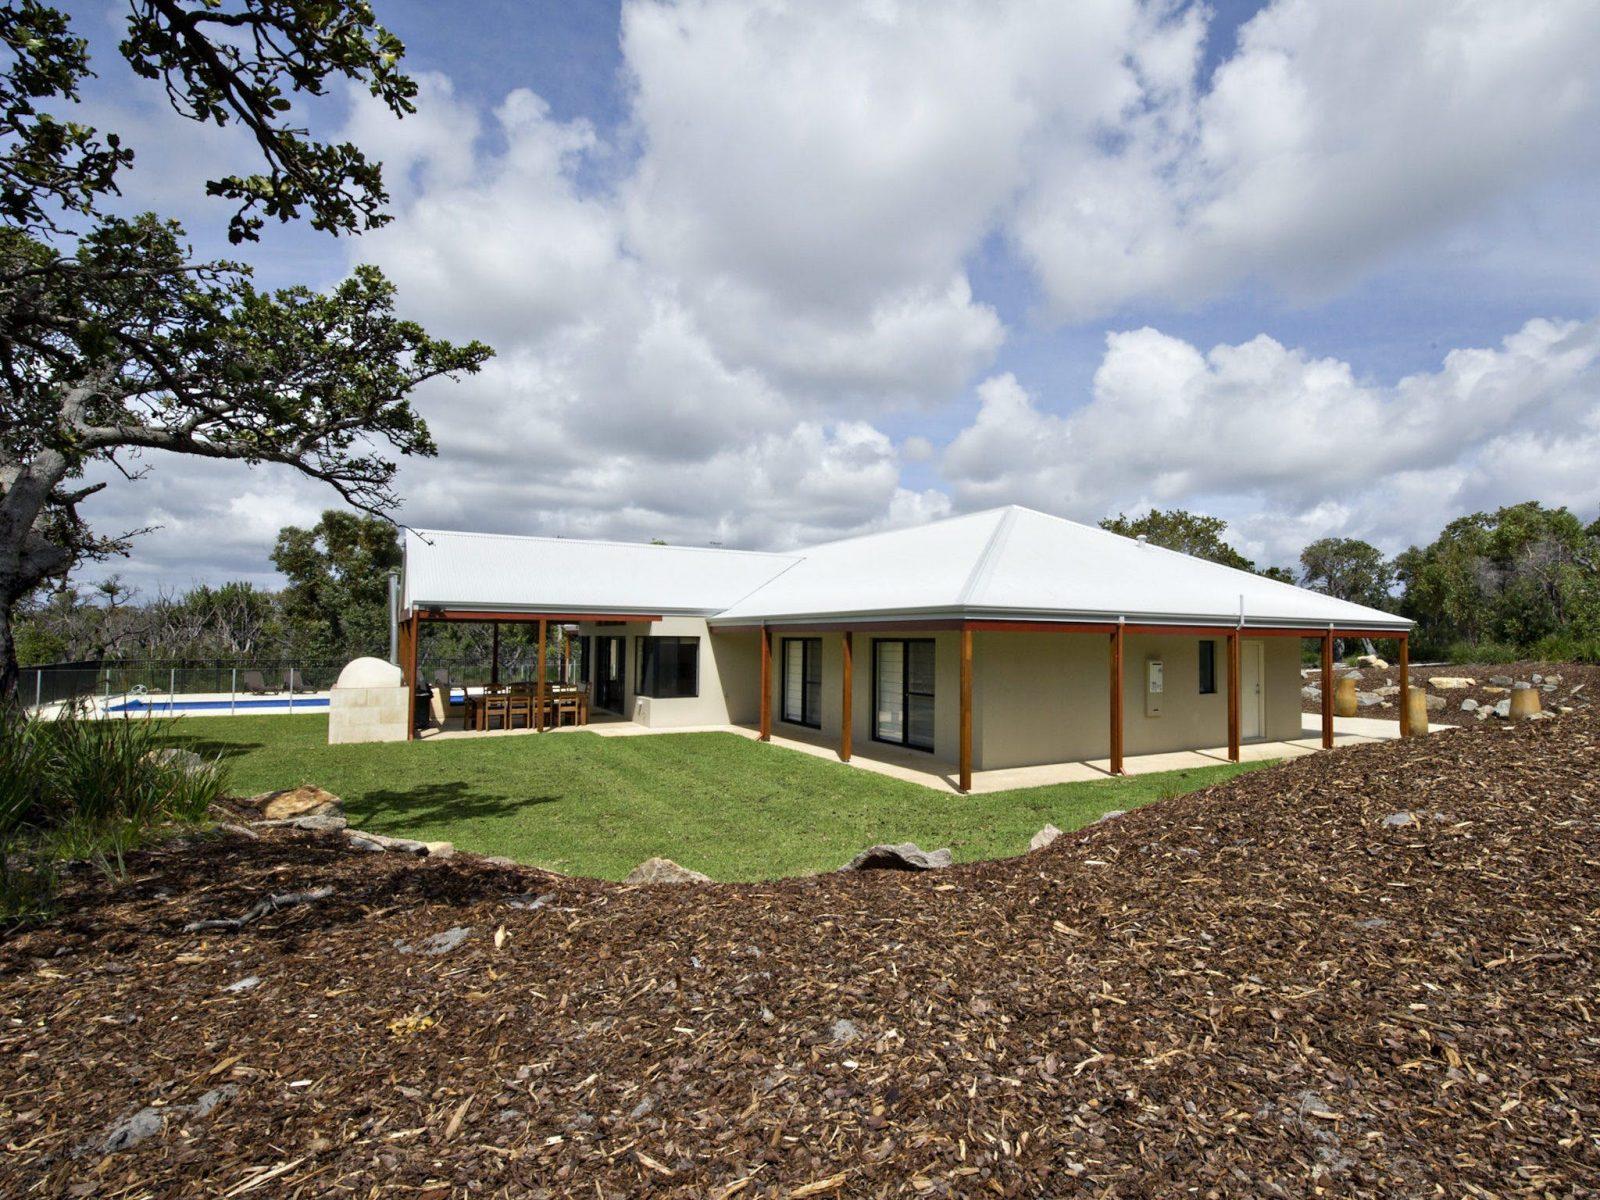 Lakes Place, Margaret River, Western Australia